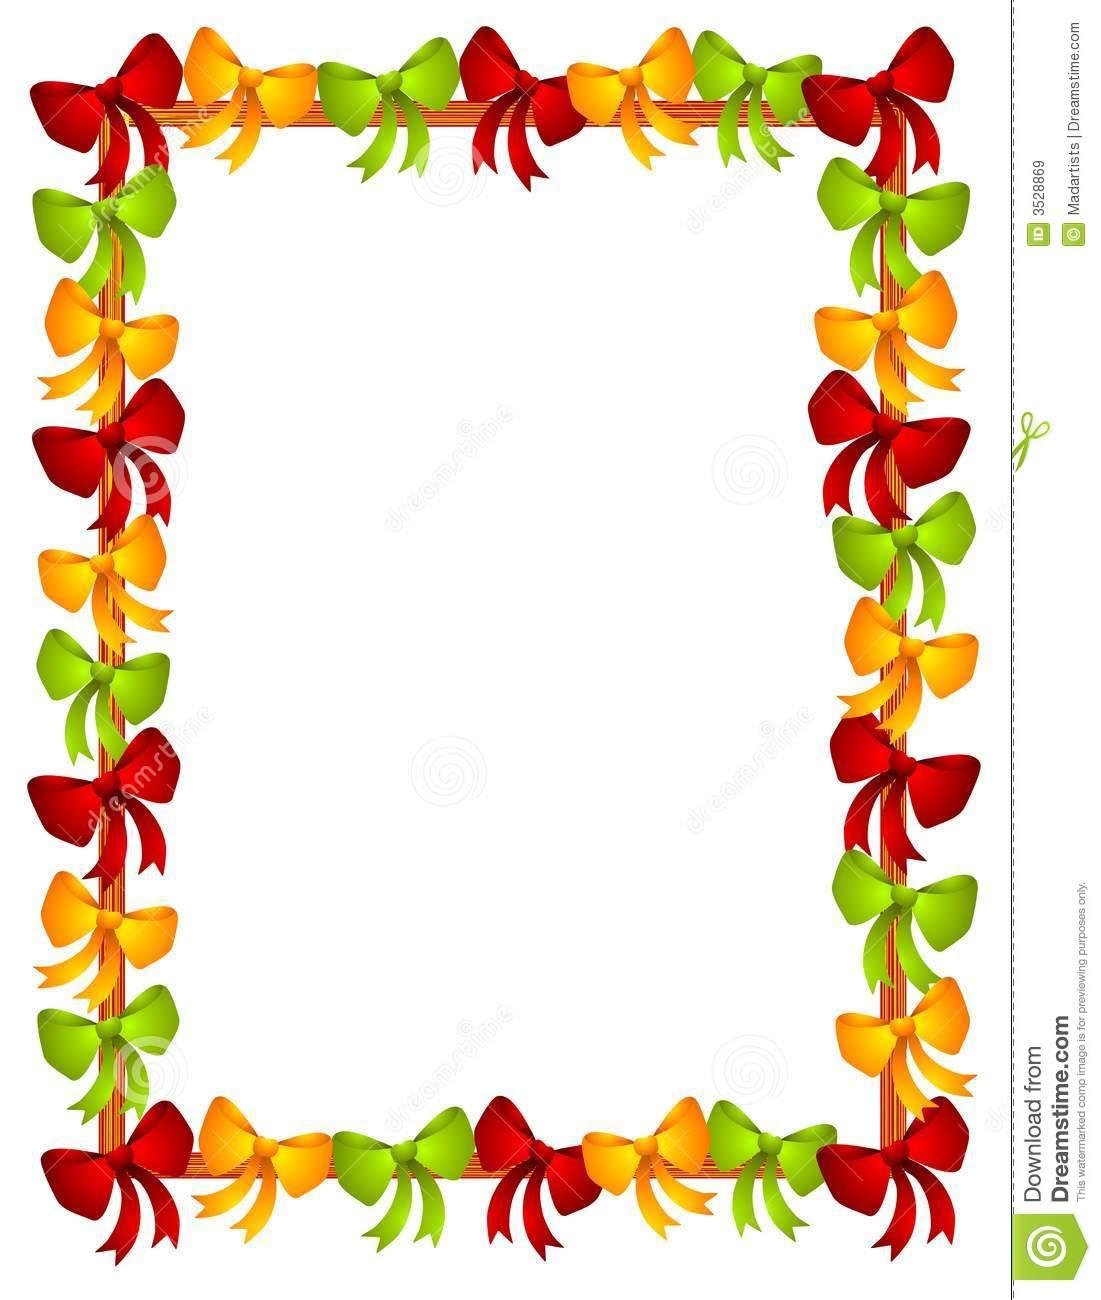 birthday frame clipart google clip art christmas free christmas clipart borders frameschristmas holly frame with